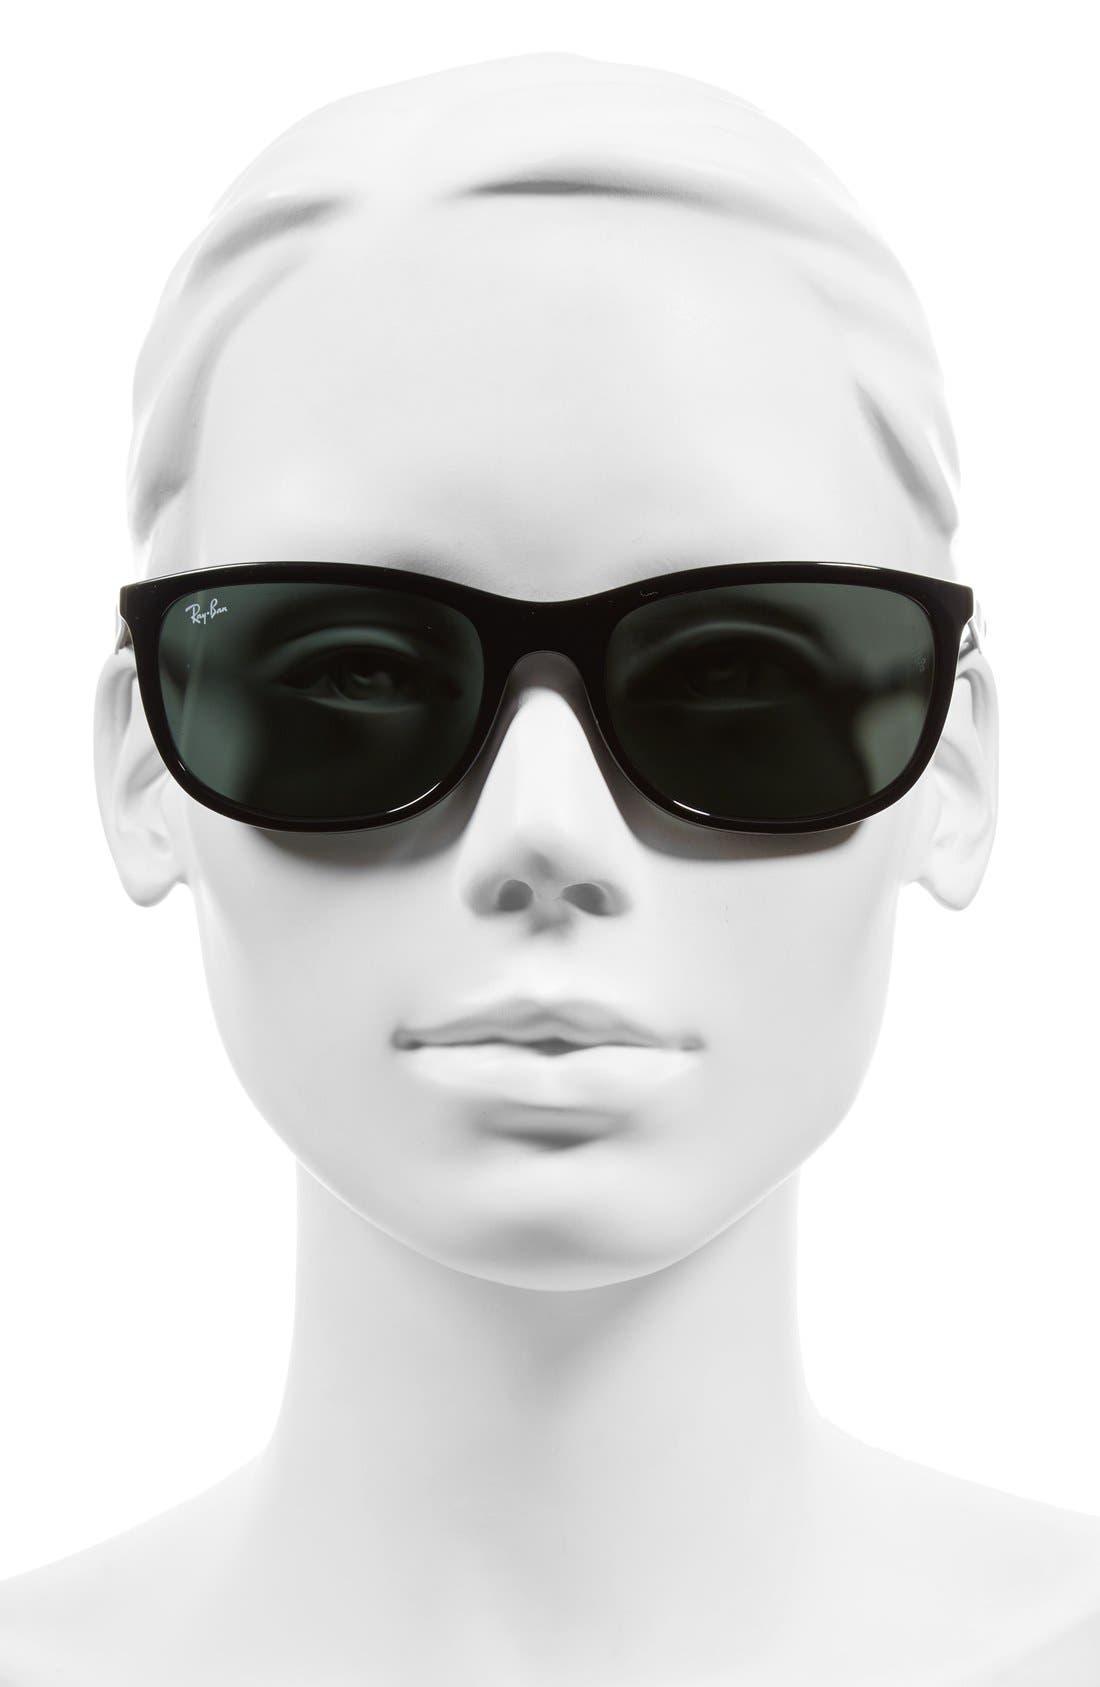 Active Lifestyle 59mm Rectangular Sunglasses,                             Alternate thumbnail 2, color,                             Black/ Green